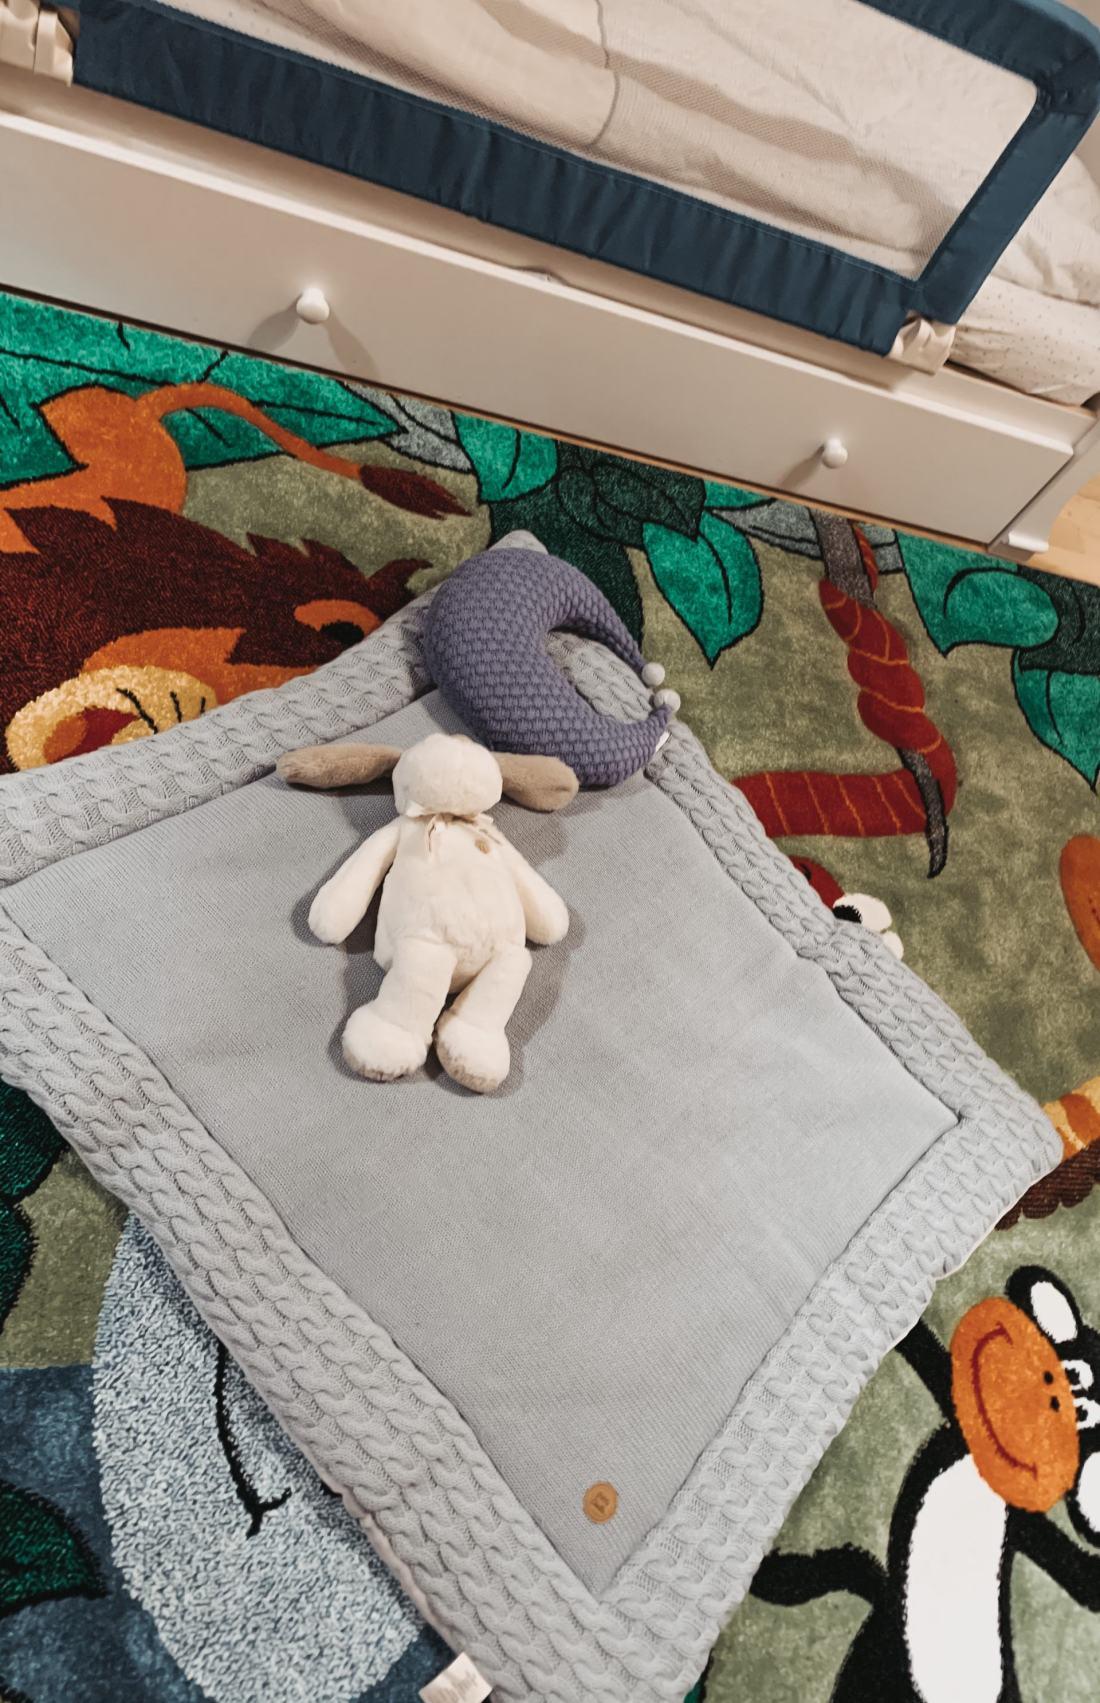 baby-nursery-room-essentials-play-pen-mat-www.stylinglifetoday.com